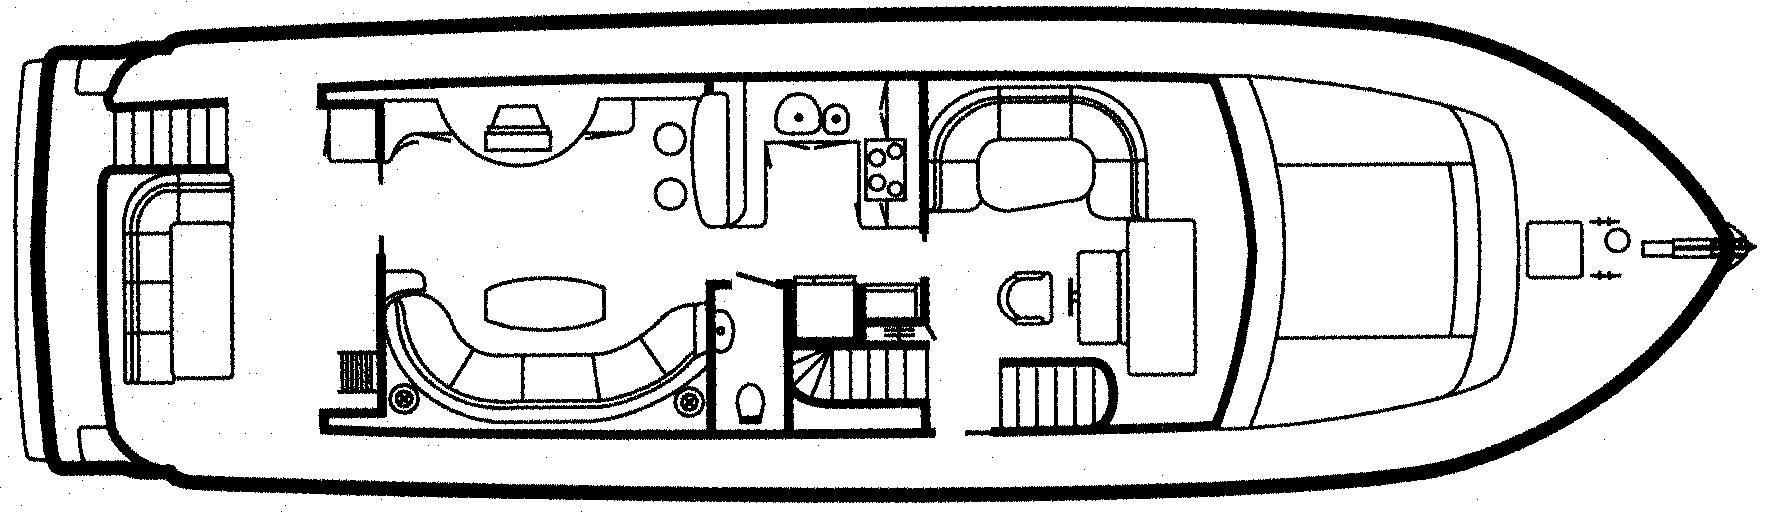 68 Sport Motor Yacht Floor Plan 2